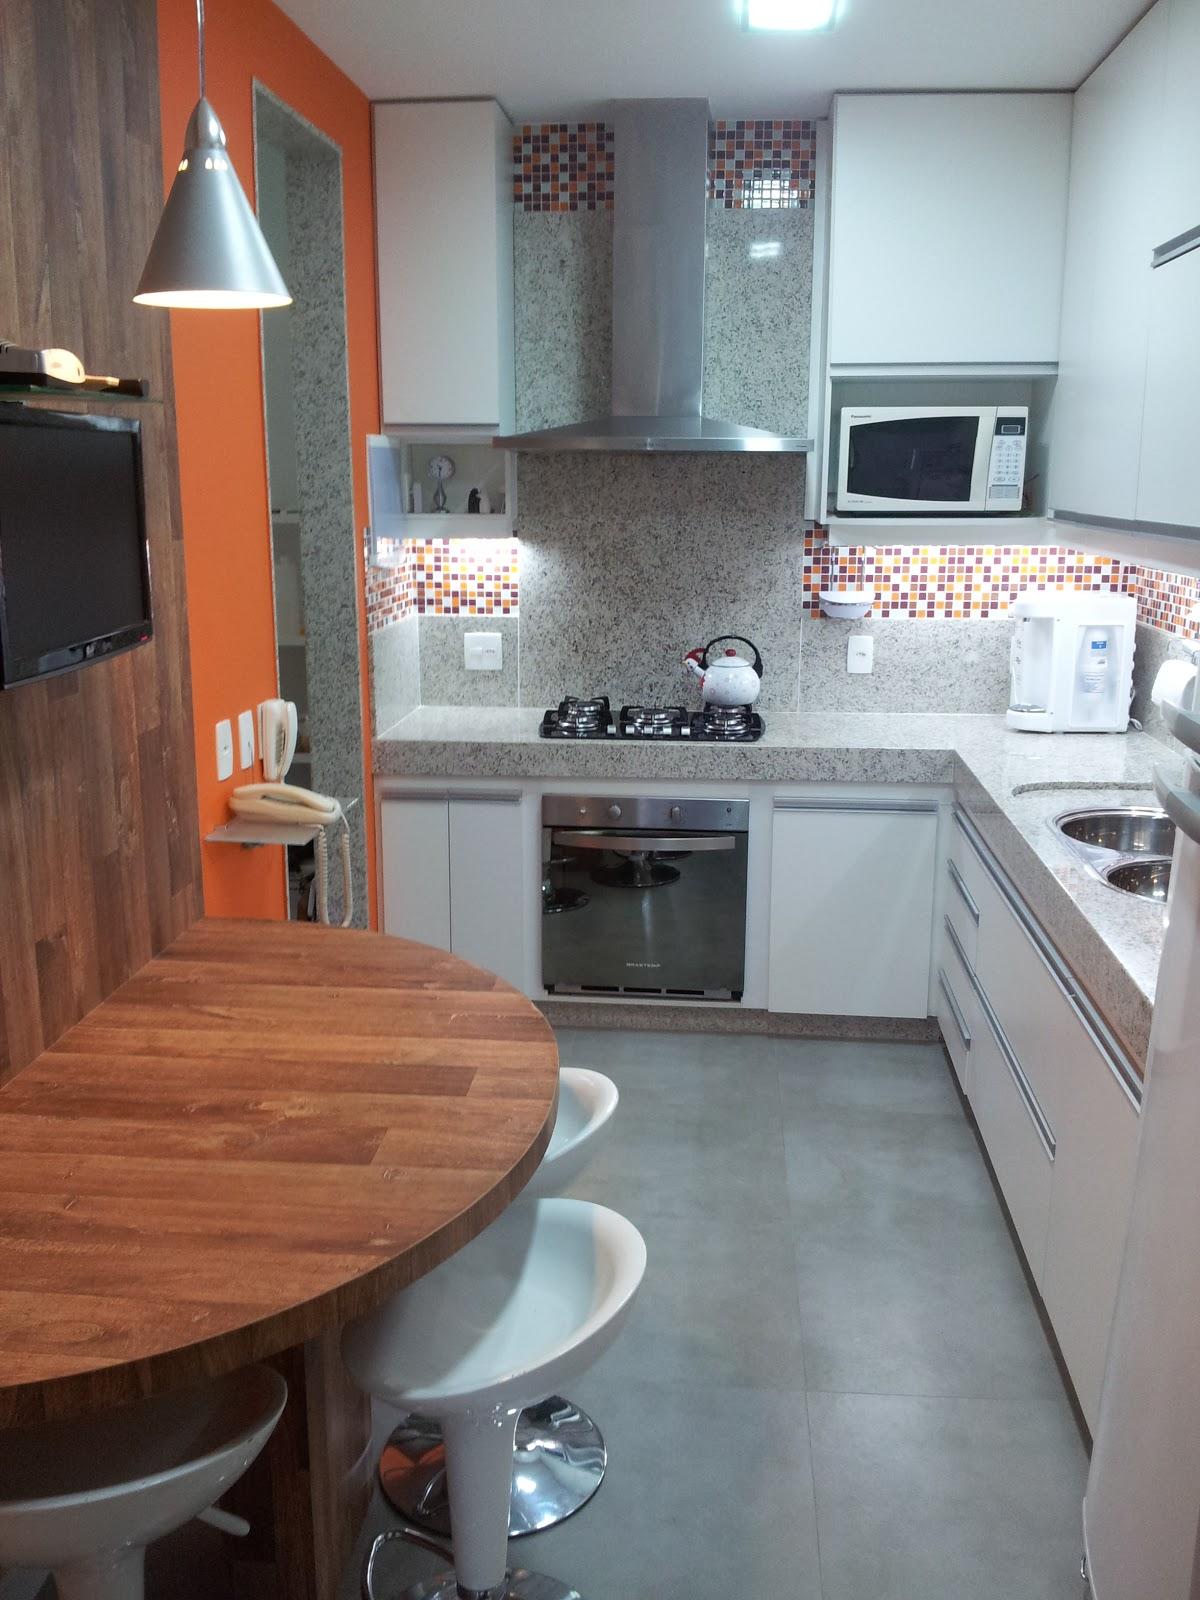 http://2.bp.blogspot.com/ ReginaSegura. arquitetura: Reforma de  #9B5130 1200x1600